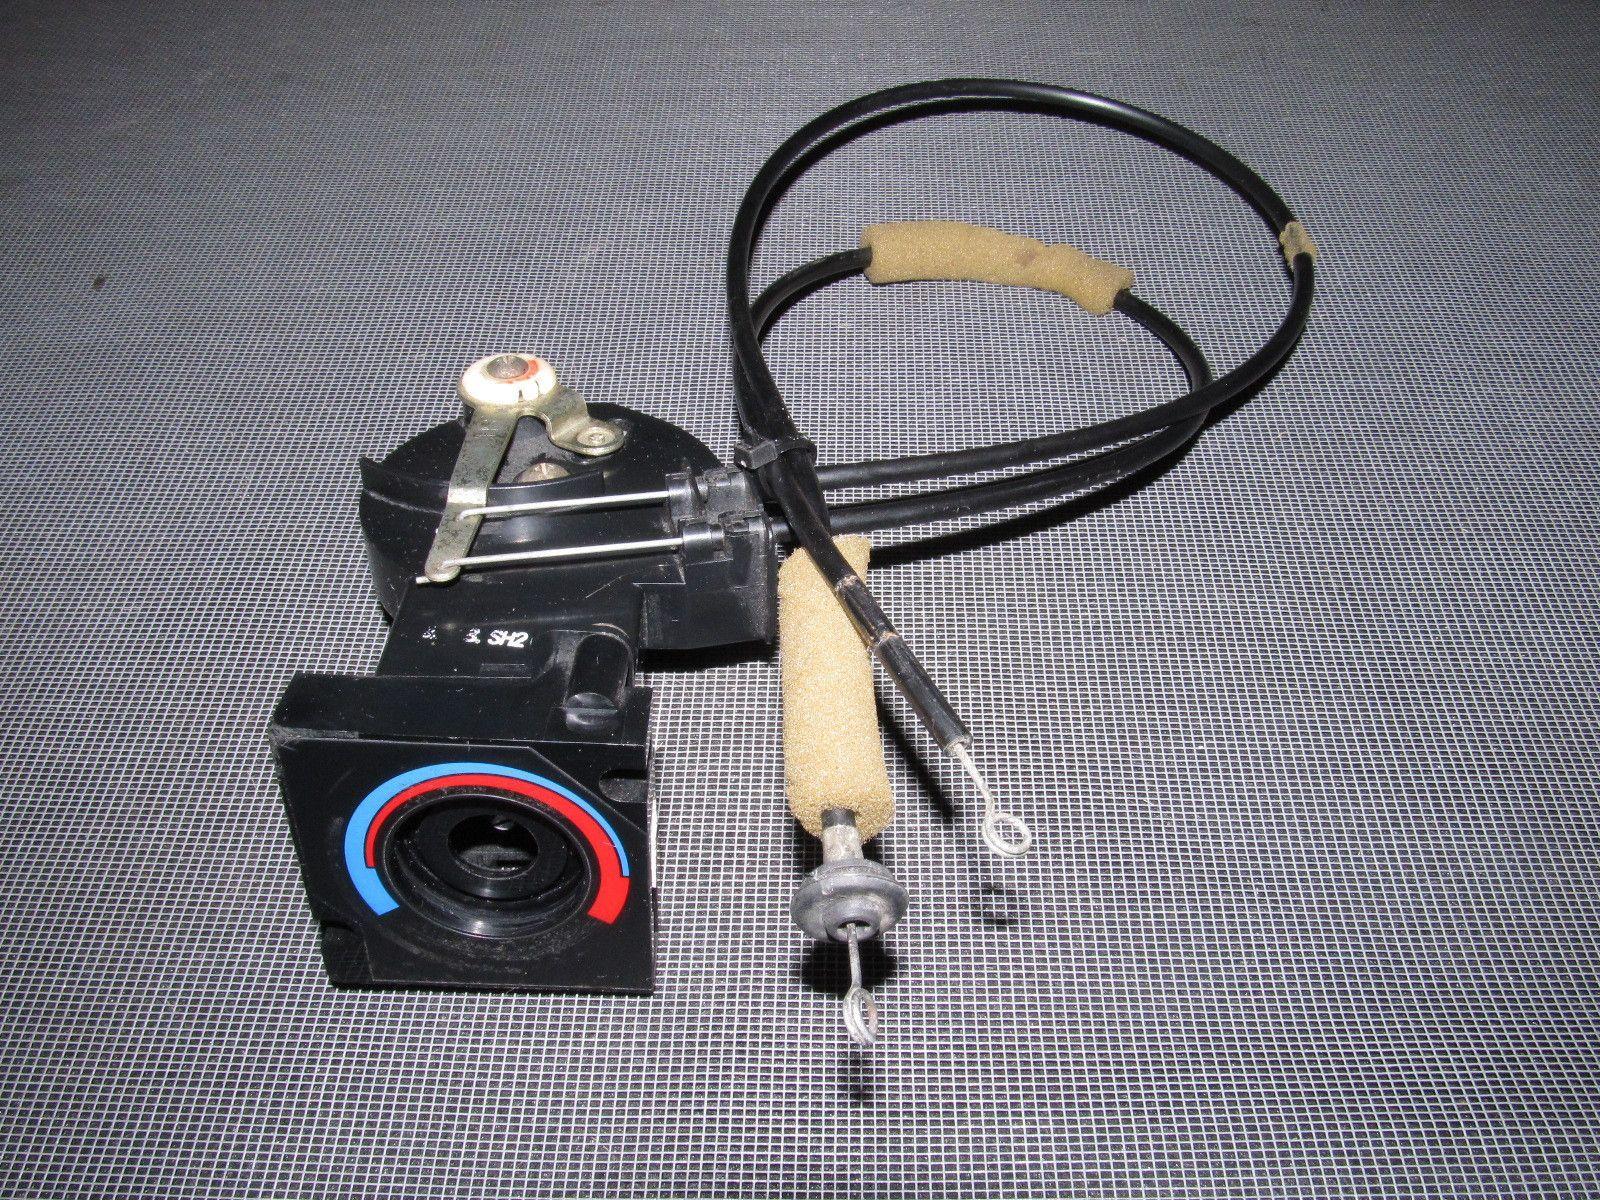 88 89 Honda CRX OEM Climate Control Heat Adjustment Switch & Cable ...